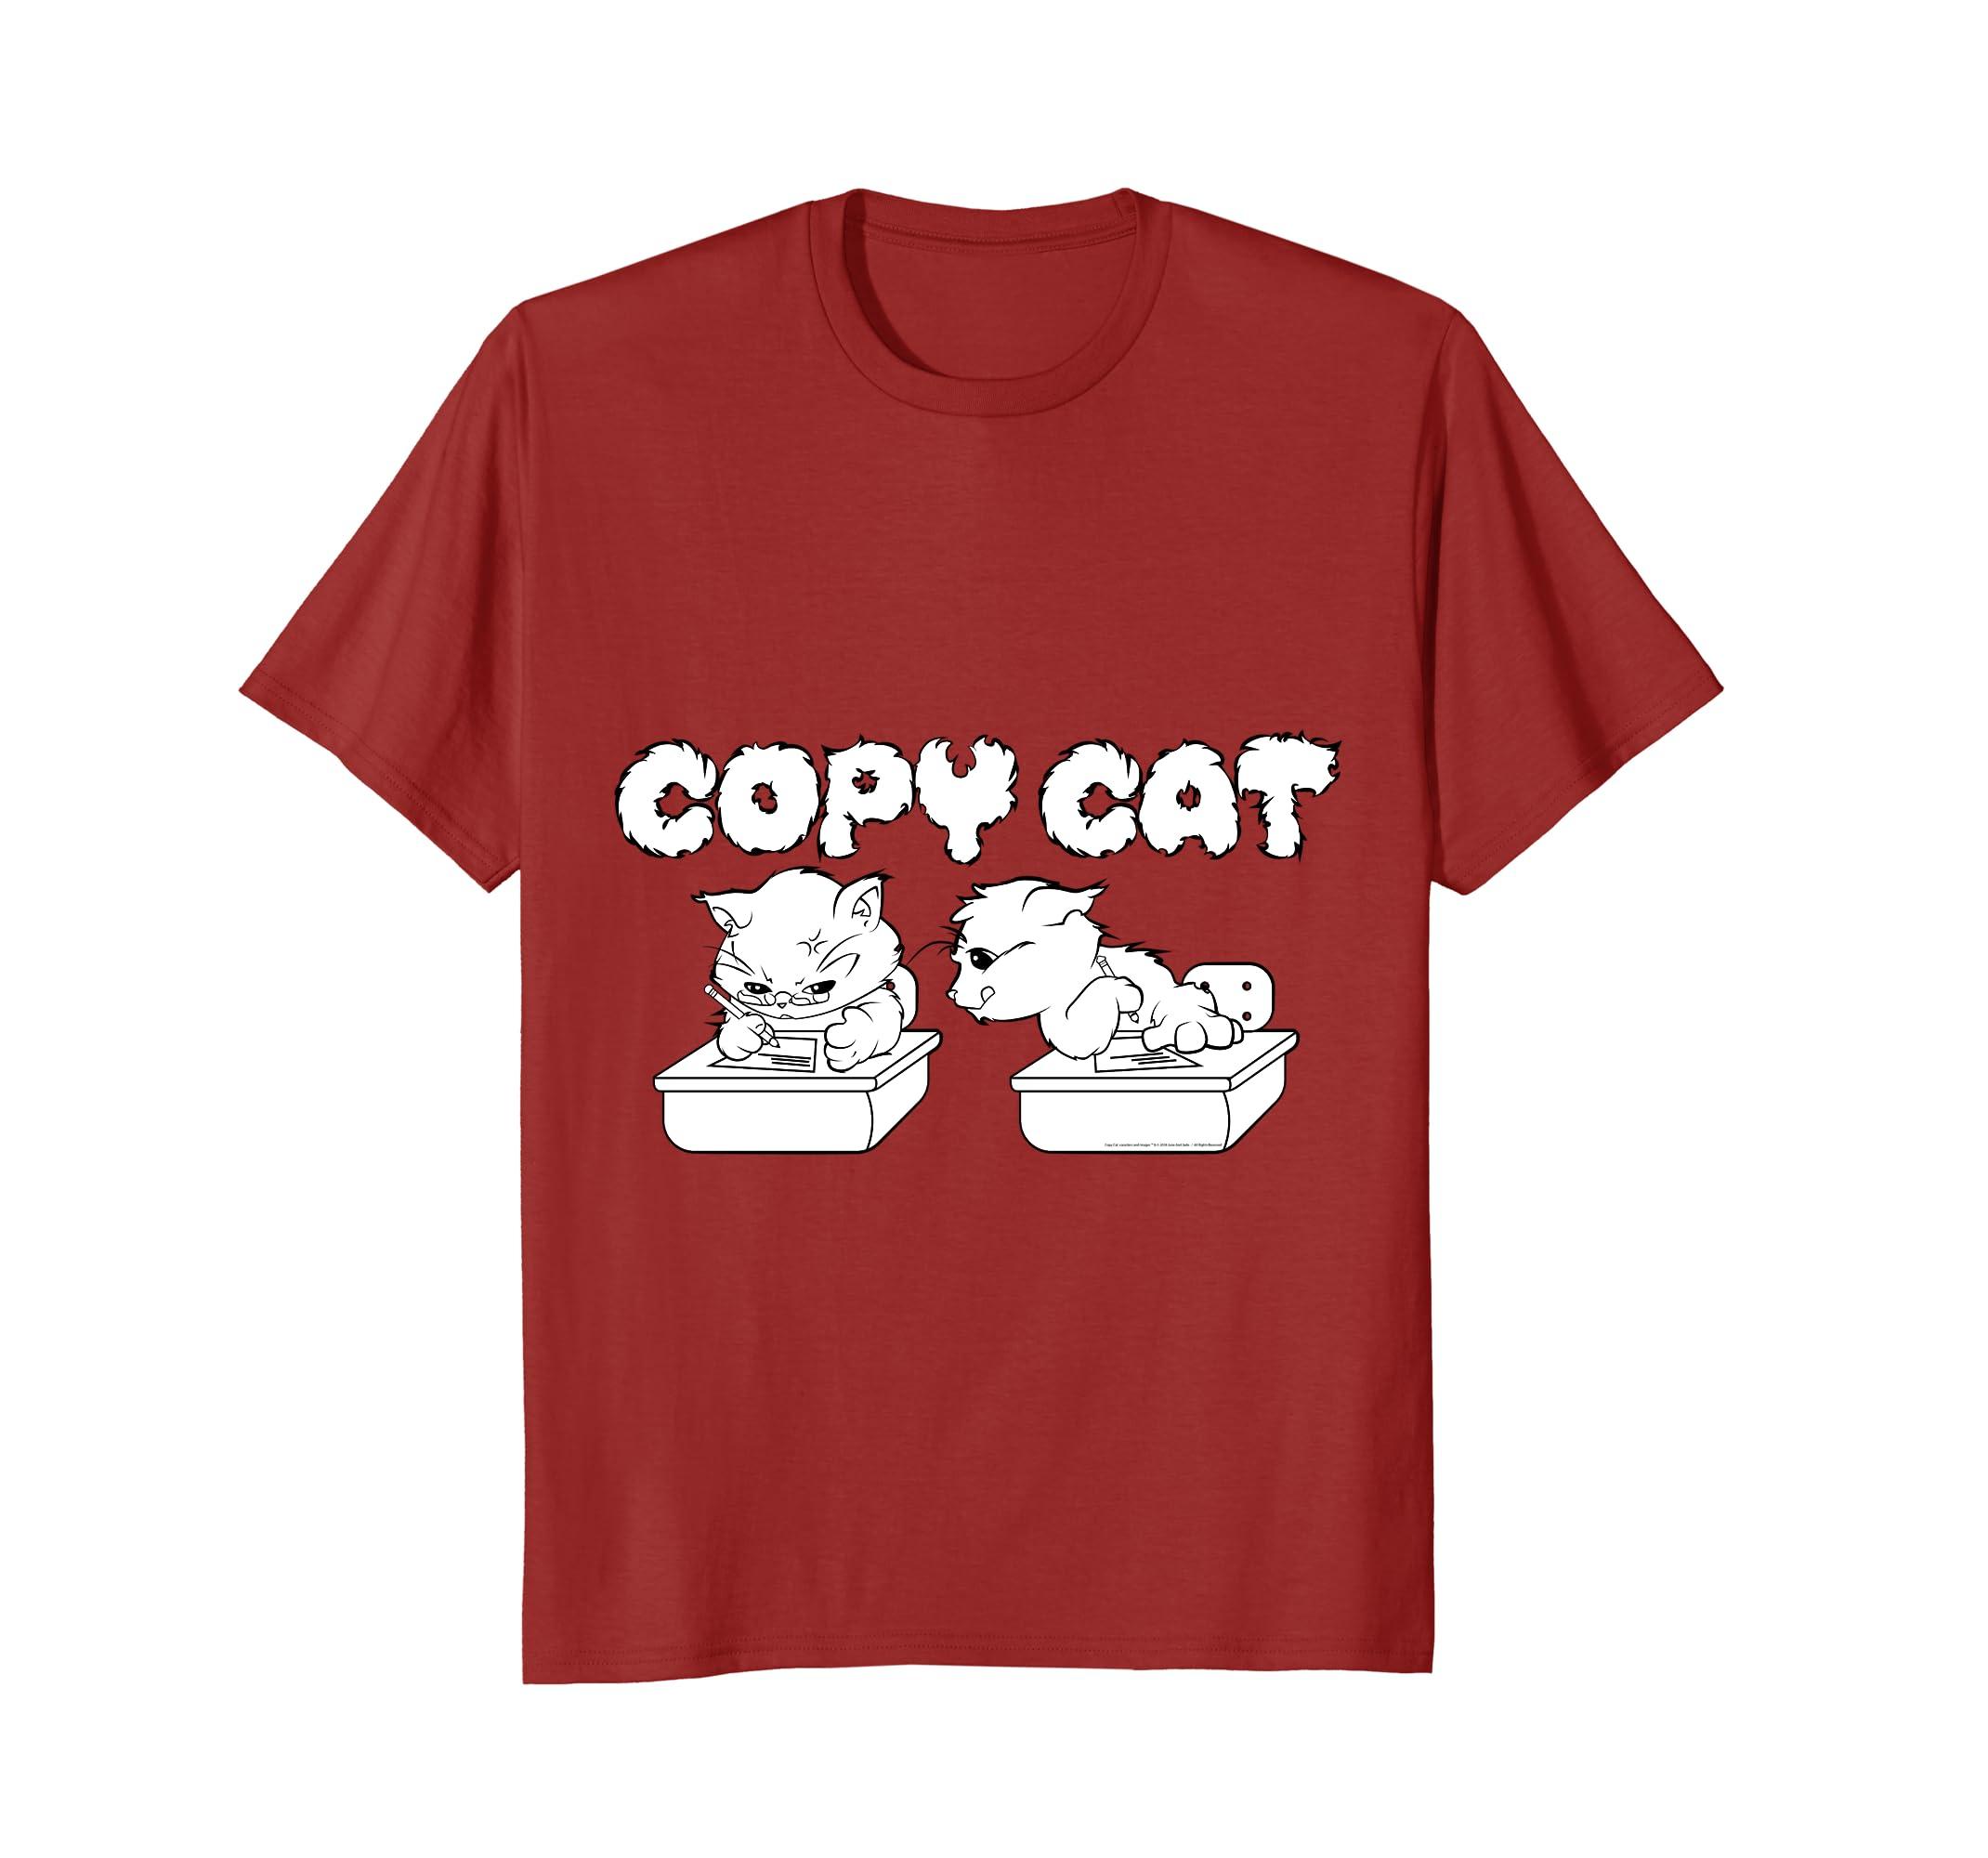 Adorable Cat T Shirt - COPY CAT Custom Design Gift Tee-ah my shirt one gift